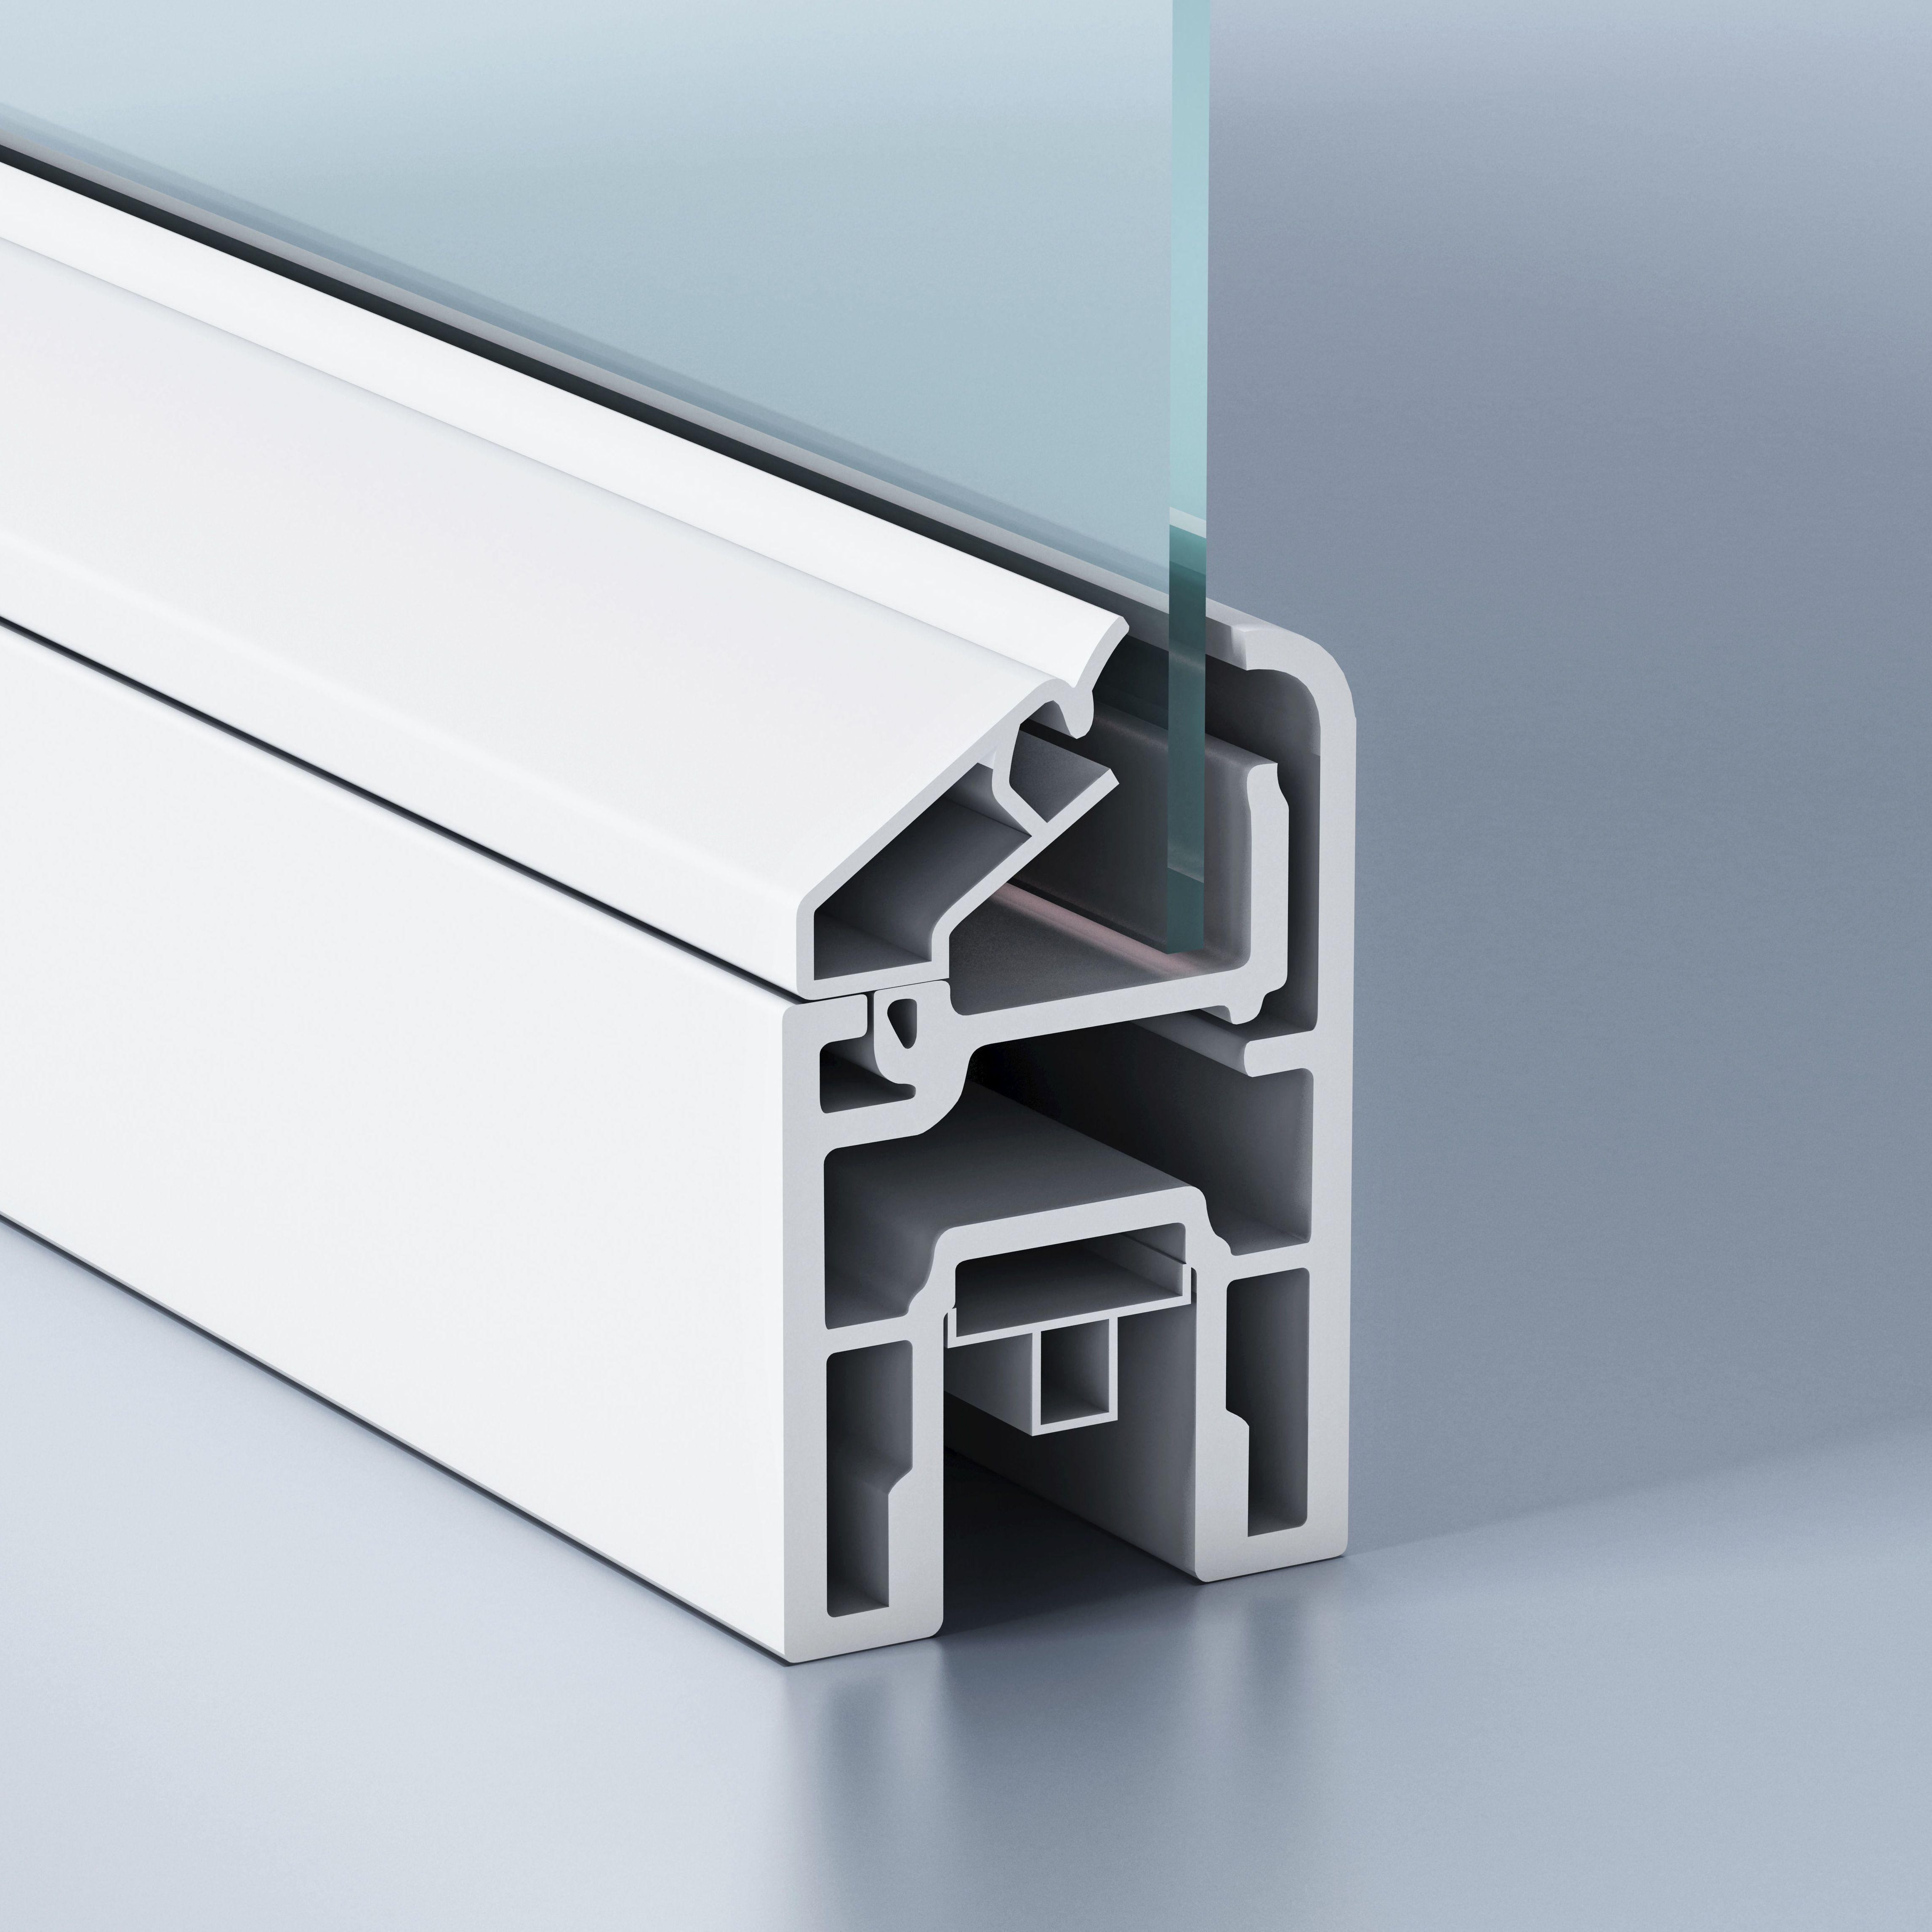 Ventana aluminio precio simple ventanas de aluminio - Ventana de aluminio precio ...